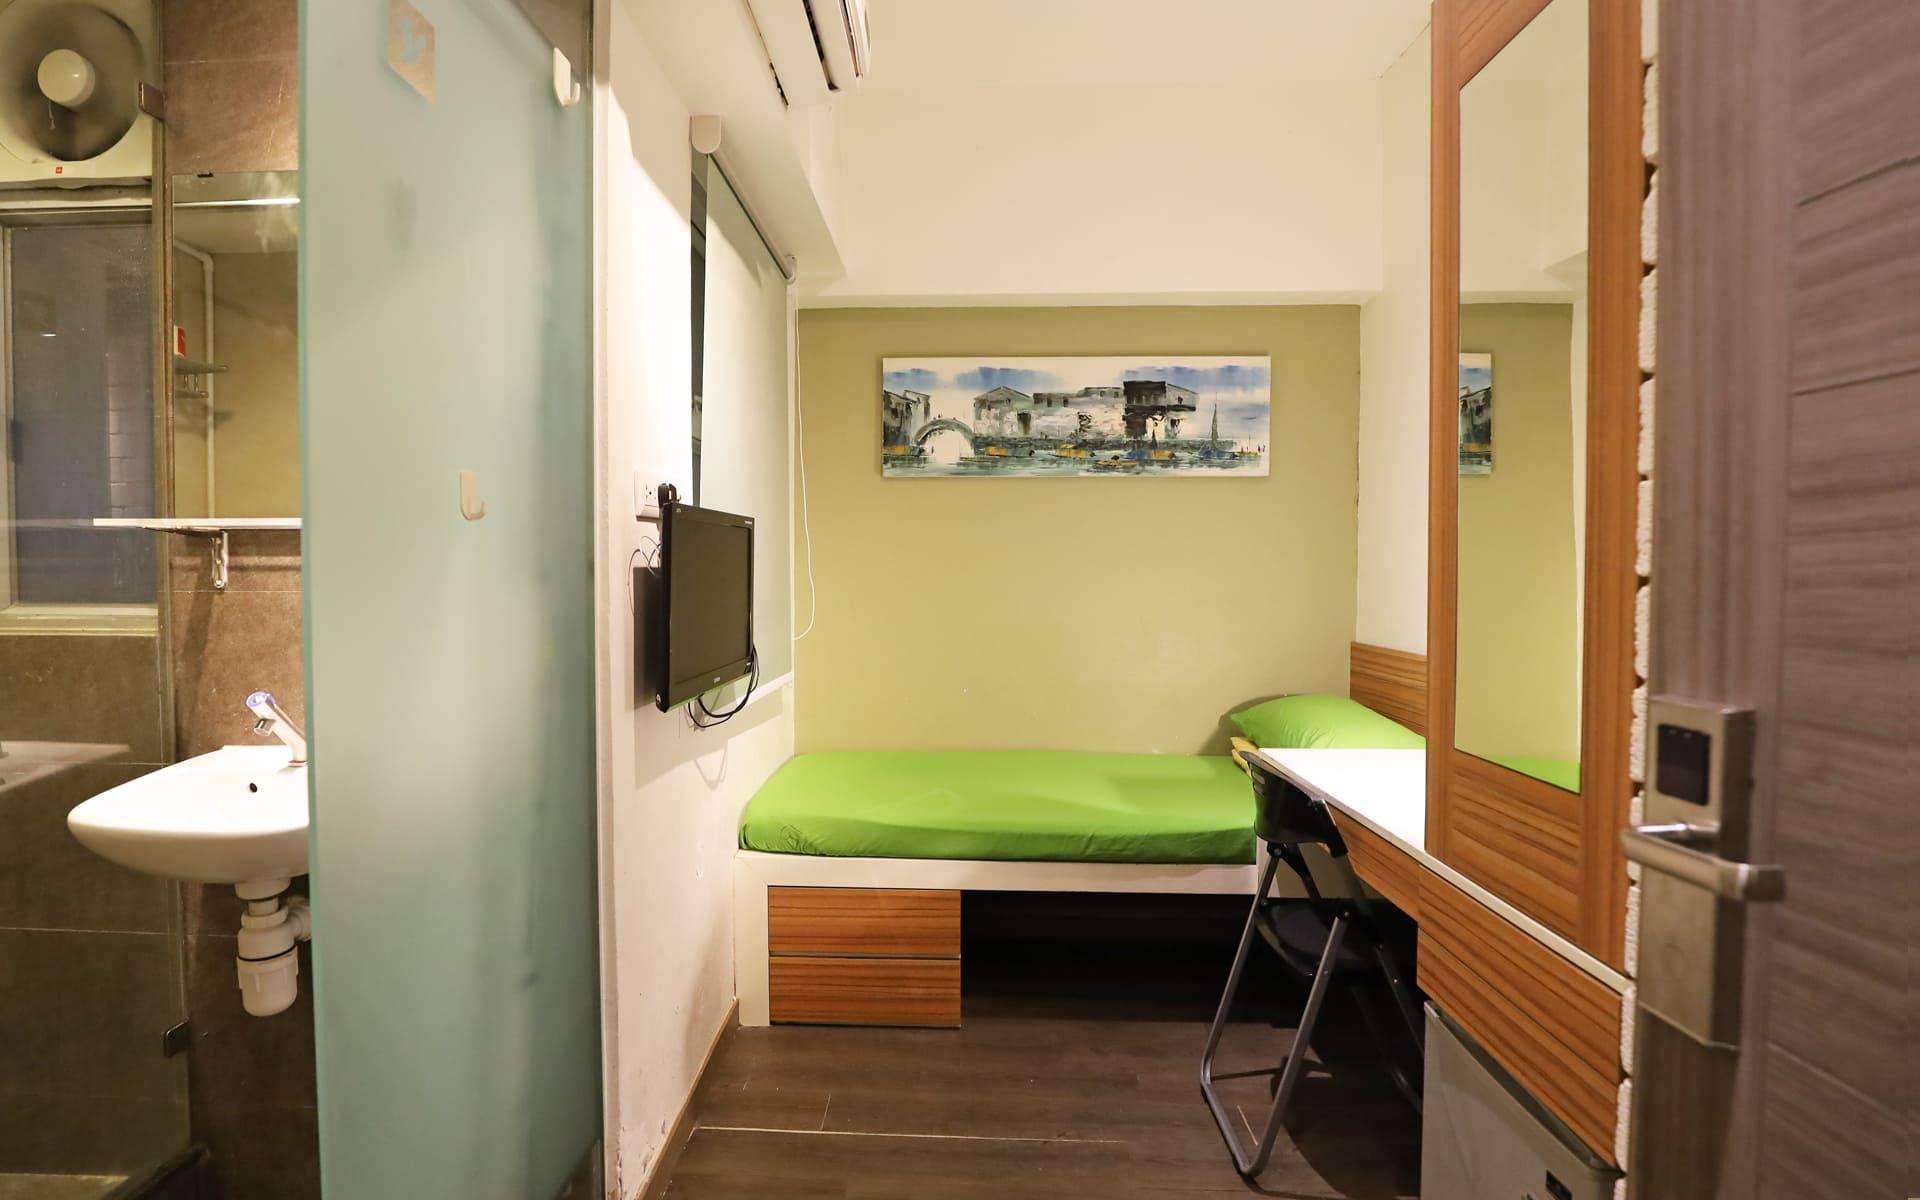 hk_service_apartment_6443766361596710121.jpg